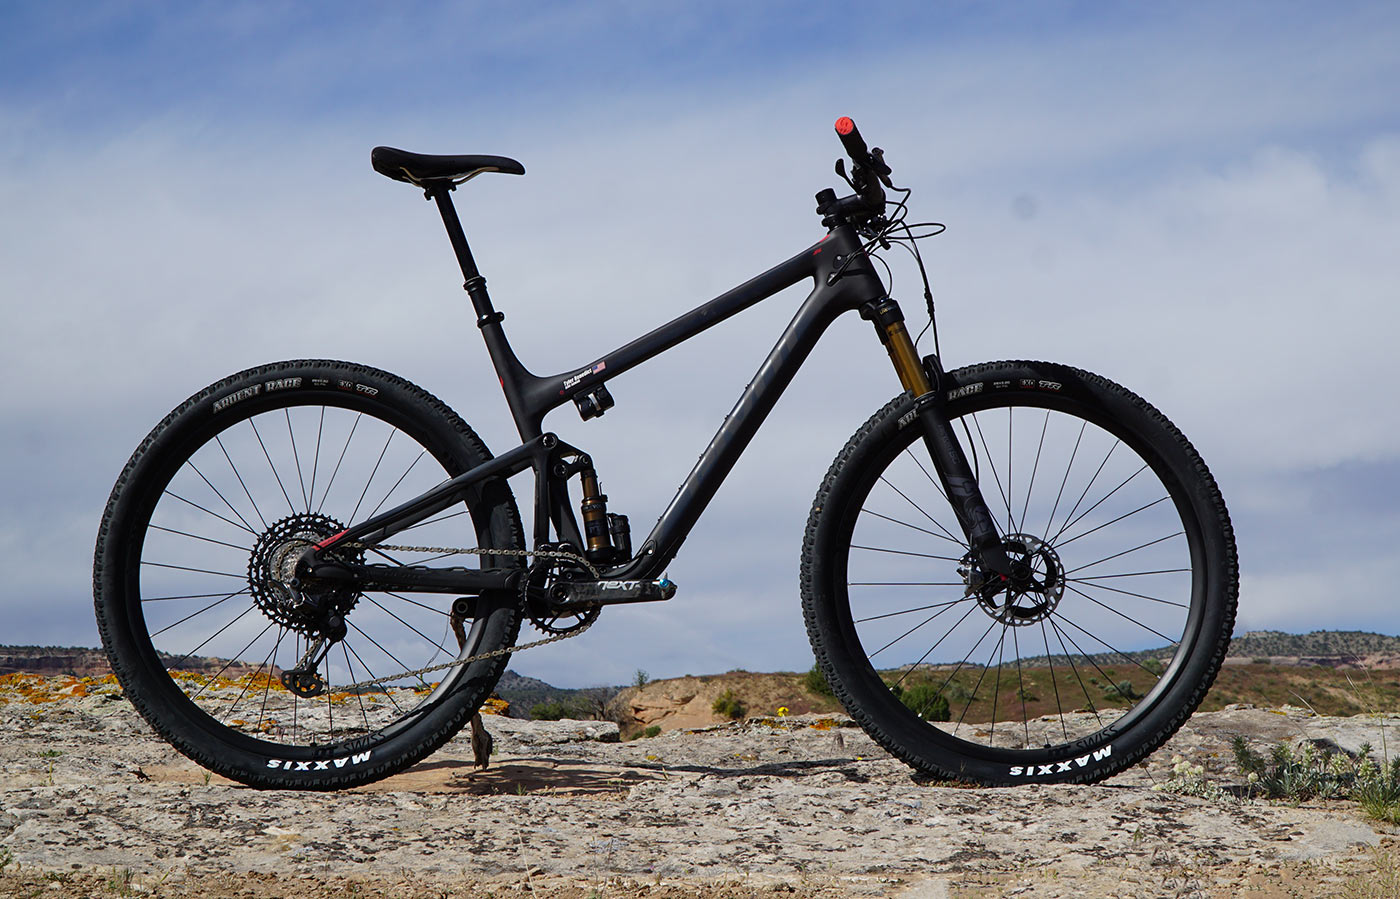 All-new Pivot Mach 4 SL mountain bike is a longer, lower